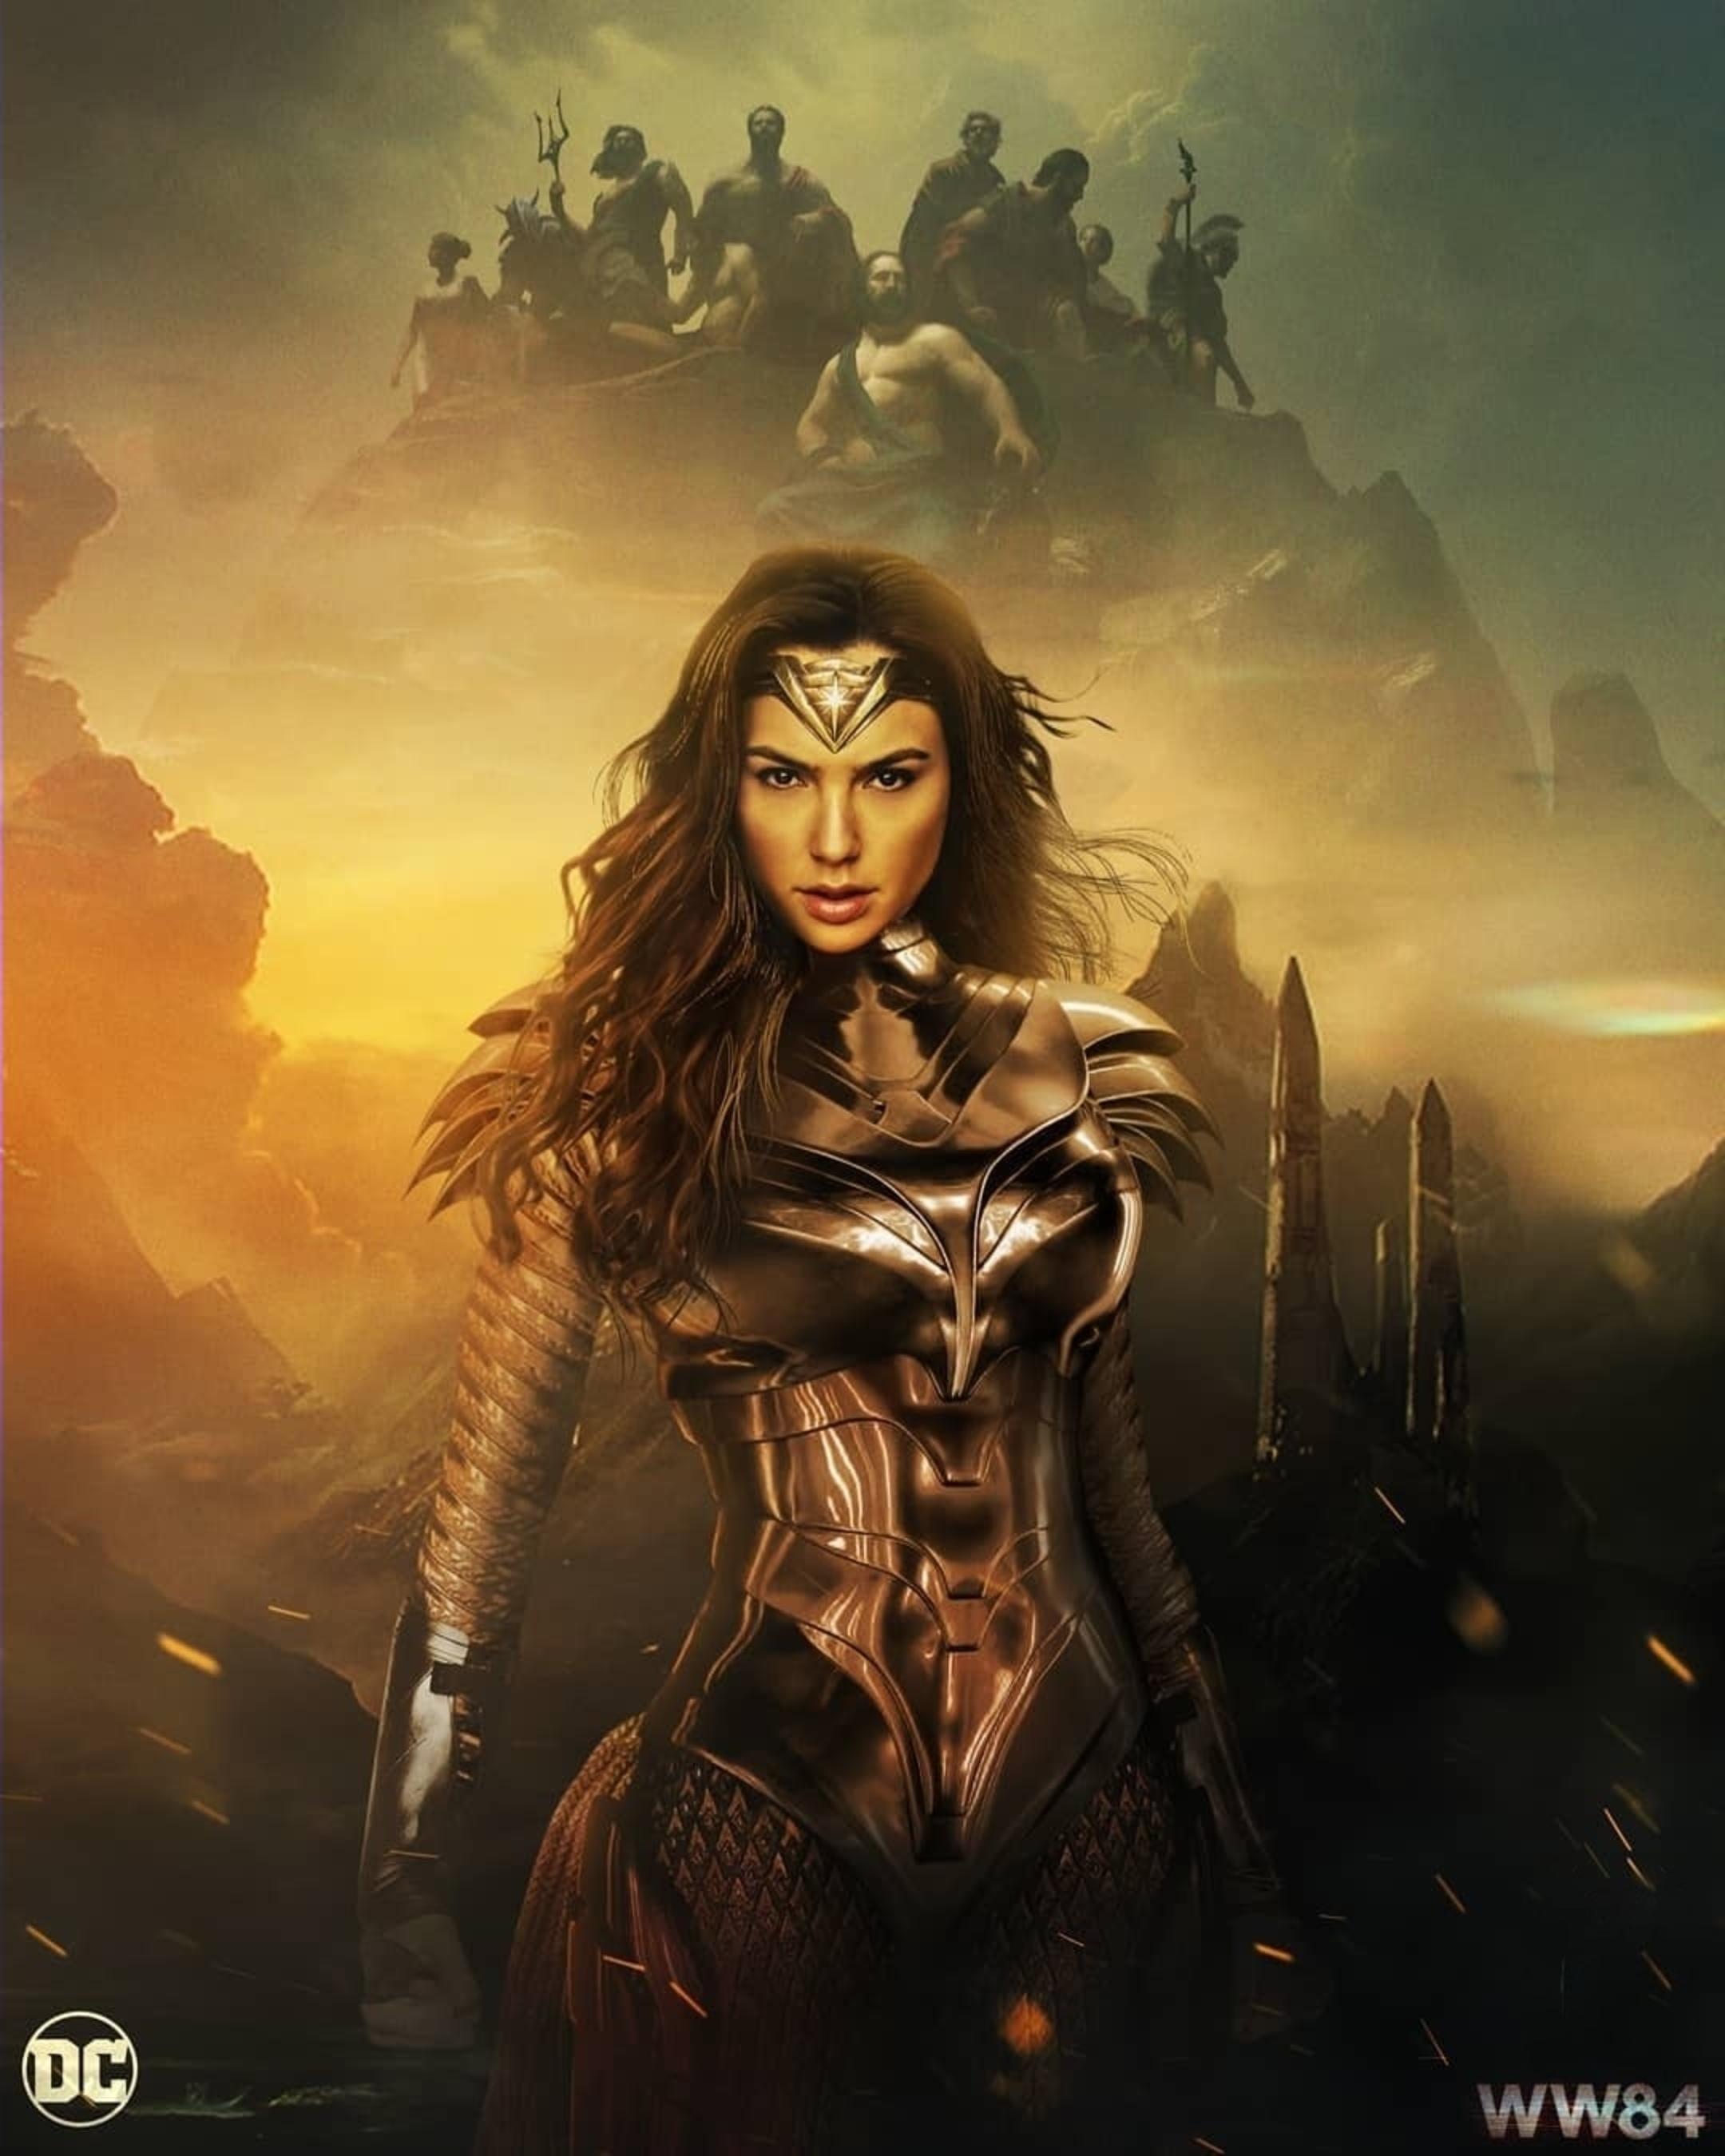 Wonder Woman 1984 2020 [2160 2700] by Ultraraw 26 Wonder woman 2160x2700